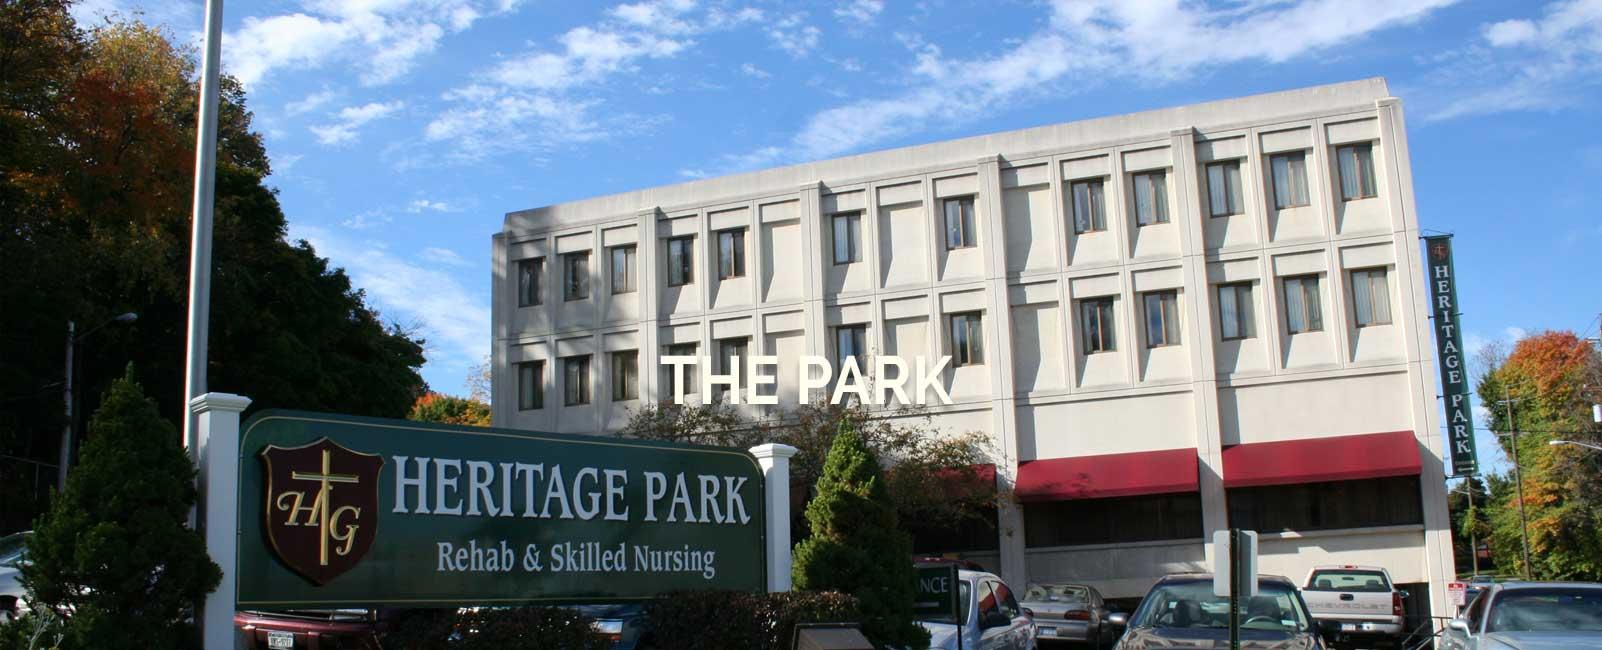 the-park-heritage-ministries-senior-housing-western-new-york